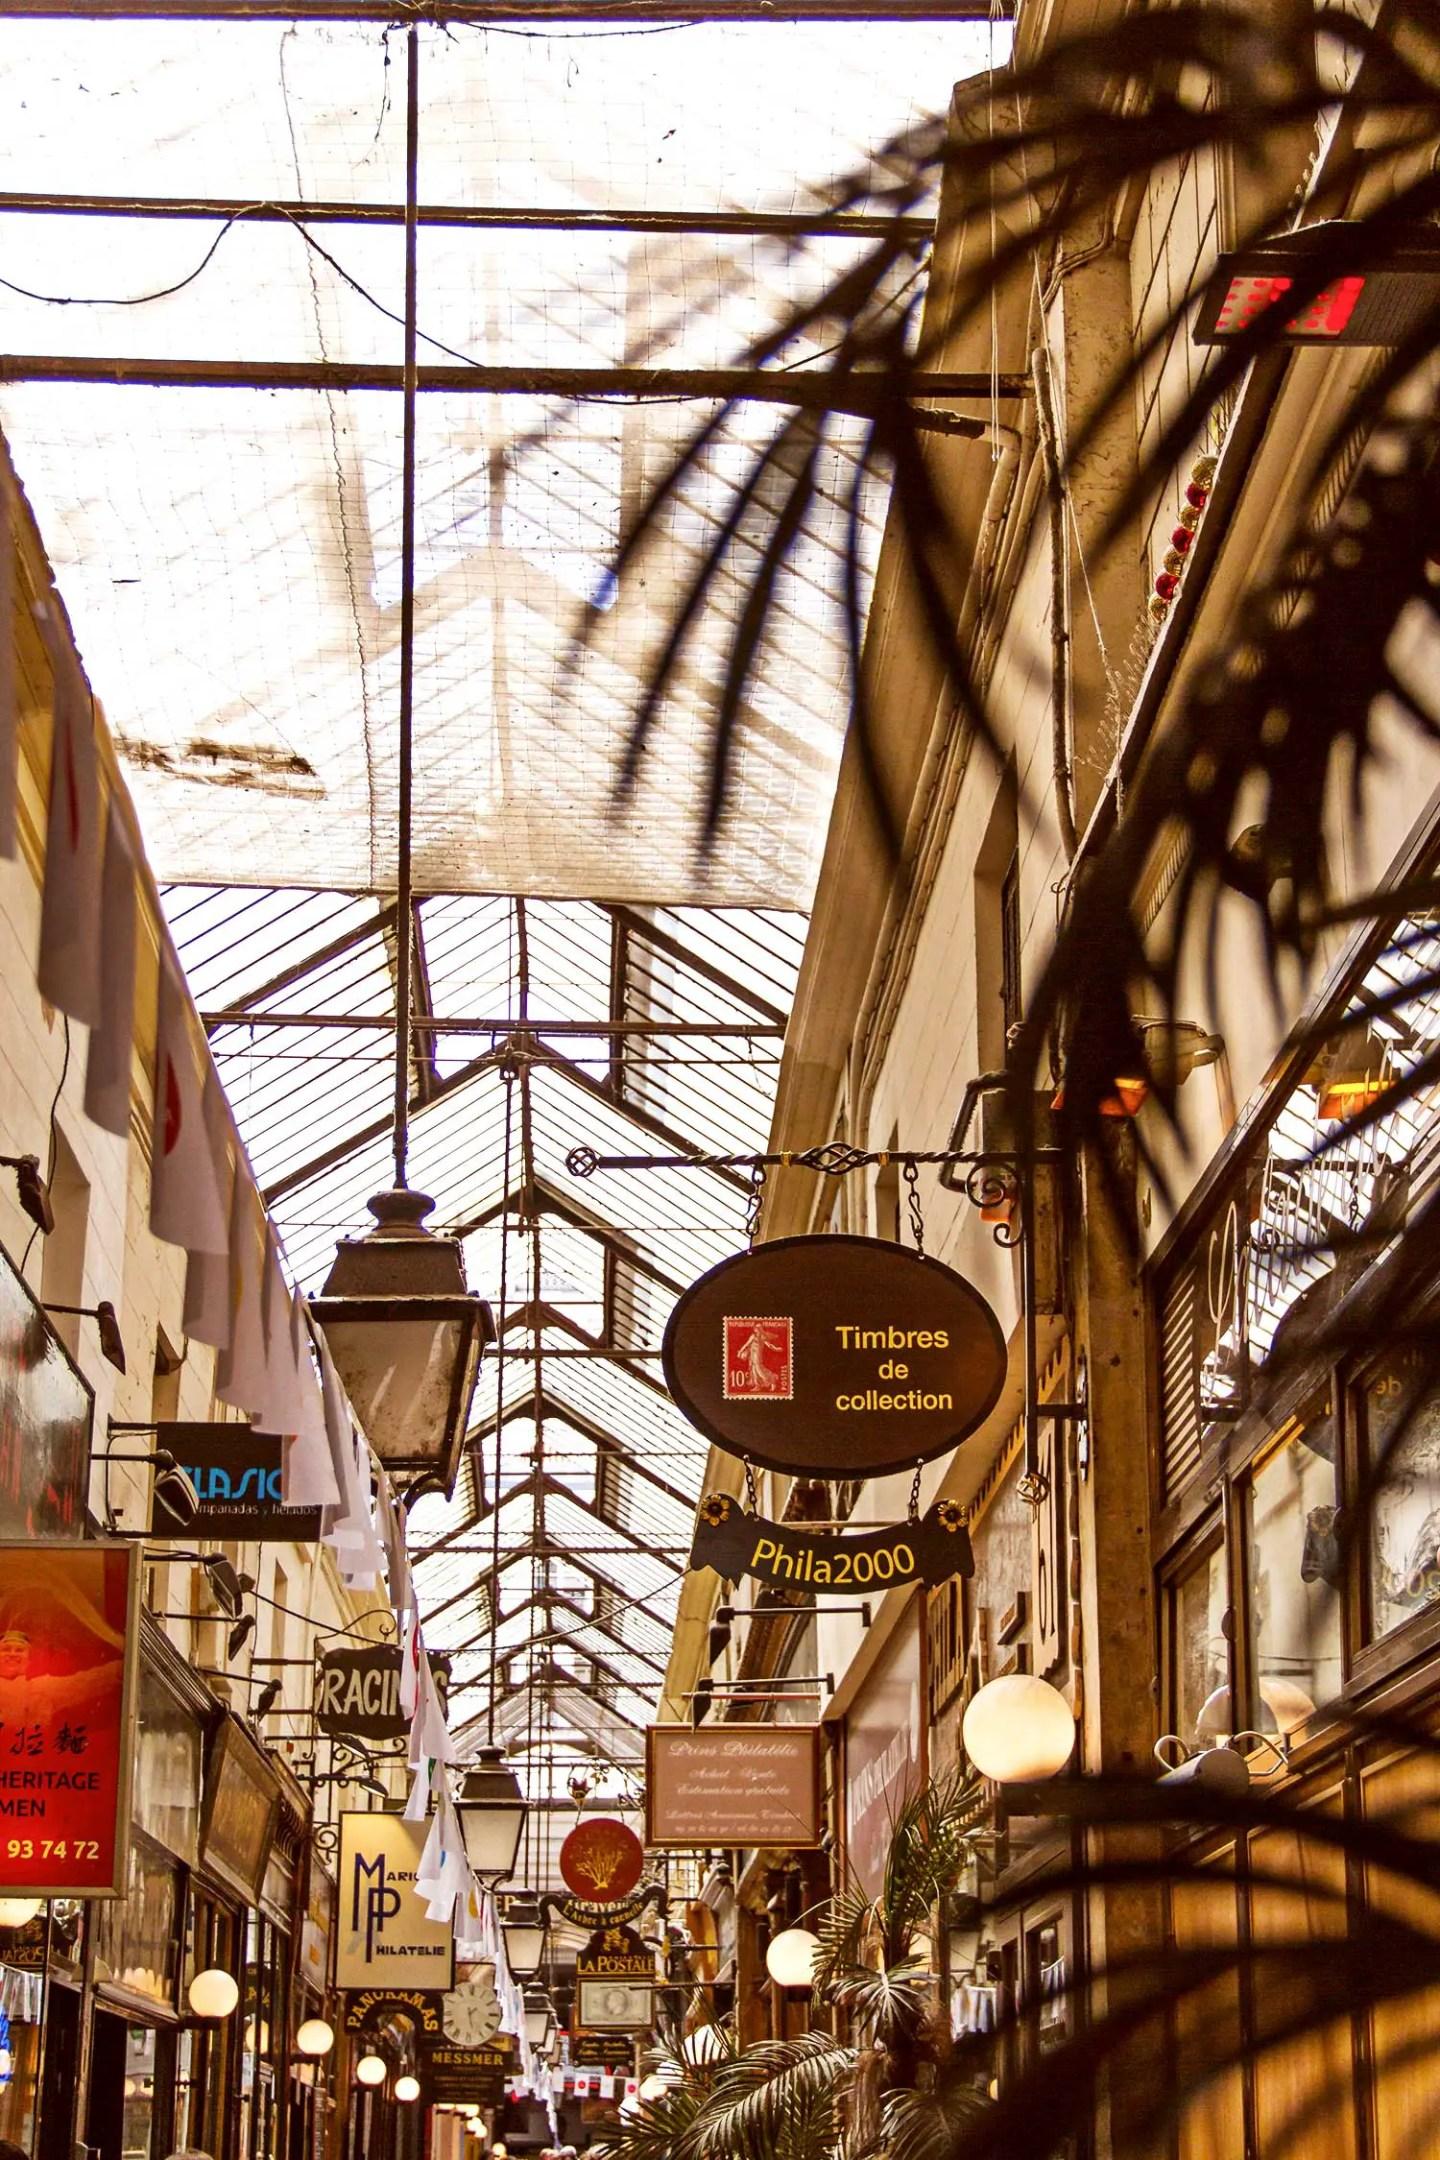 Passage des Panoramas - Paris